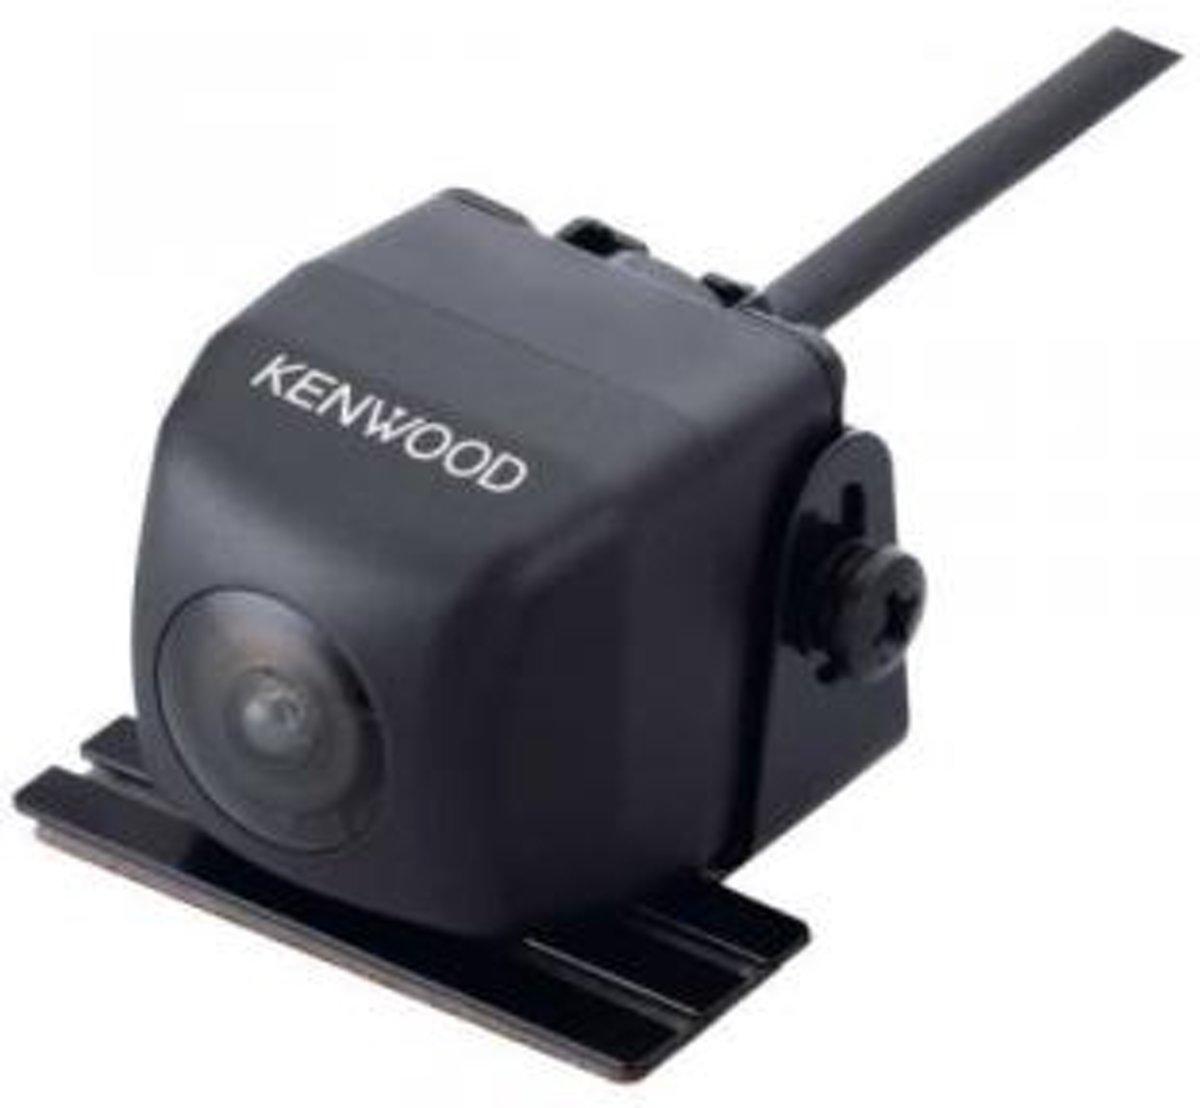 Kenwood CMOS130 achteruitrij camera